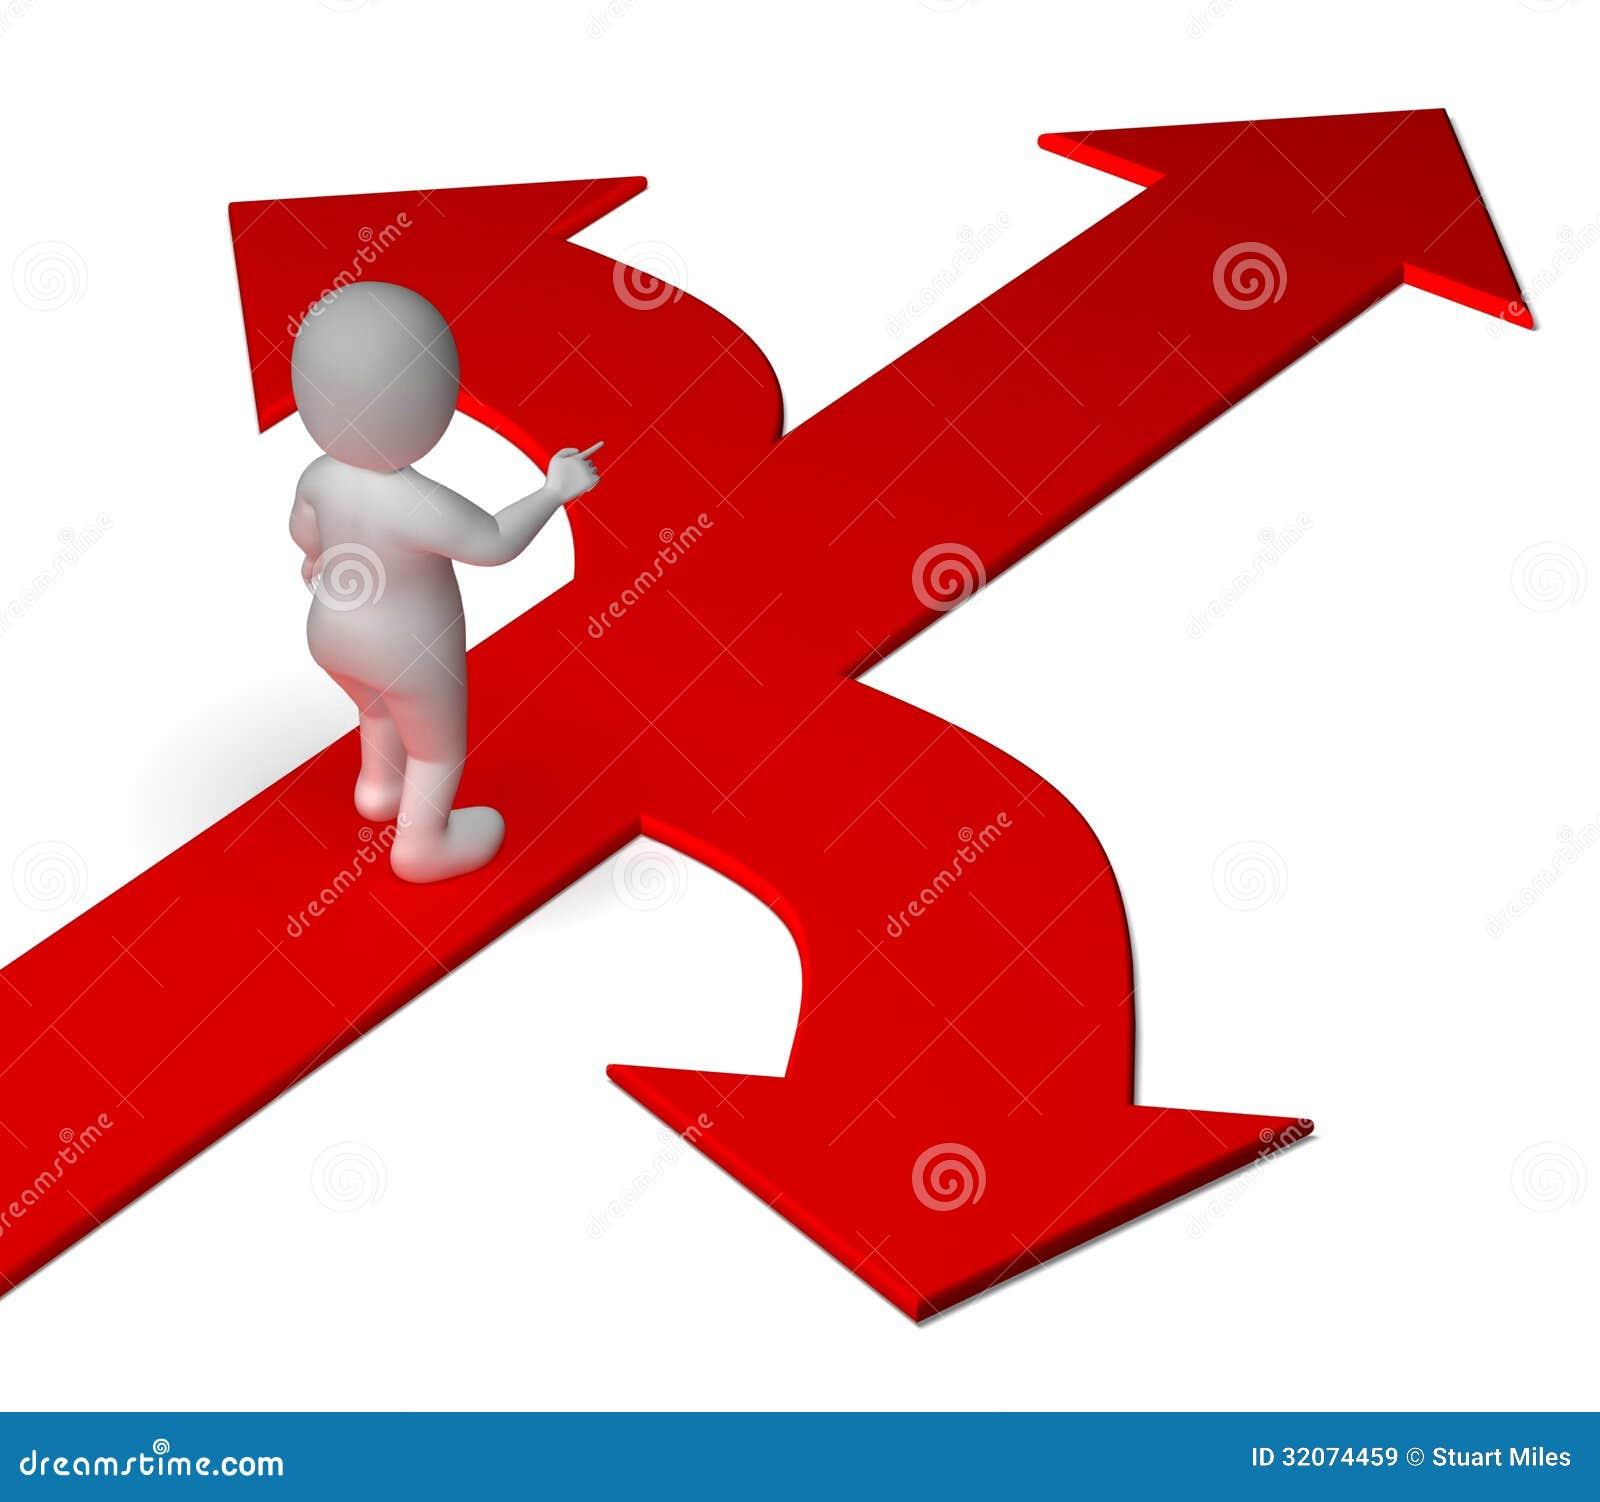 Arrows Choice Showing Options Alternatives Or Deciding